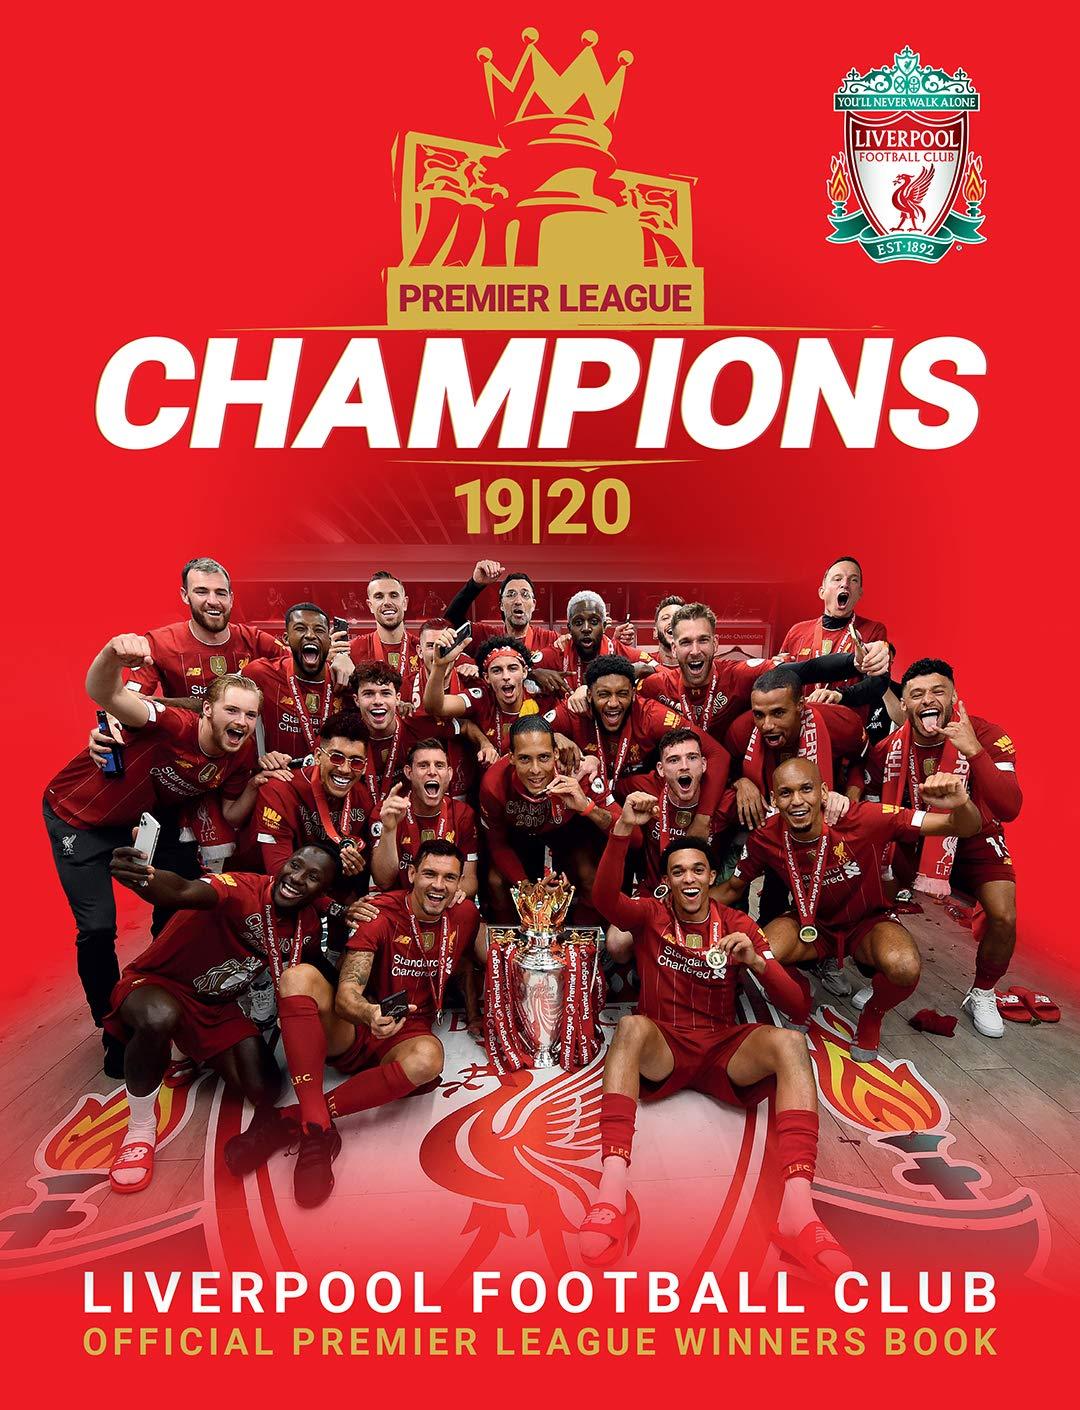 Champions Liverpool Fc Premier League Winners 19 20 Liverpool Fc Amazon Nl